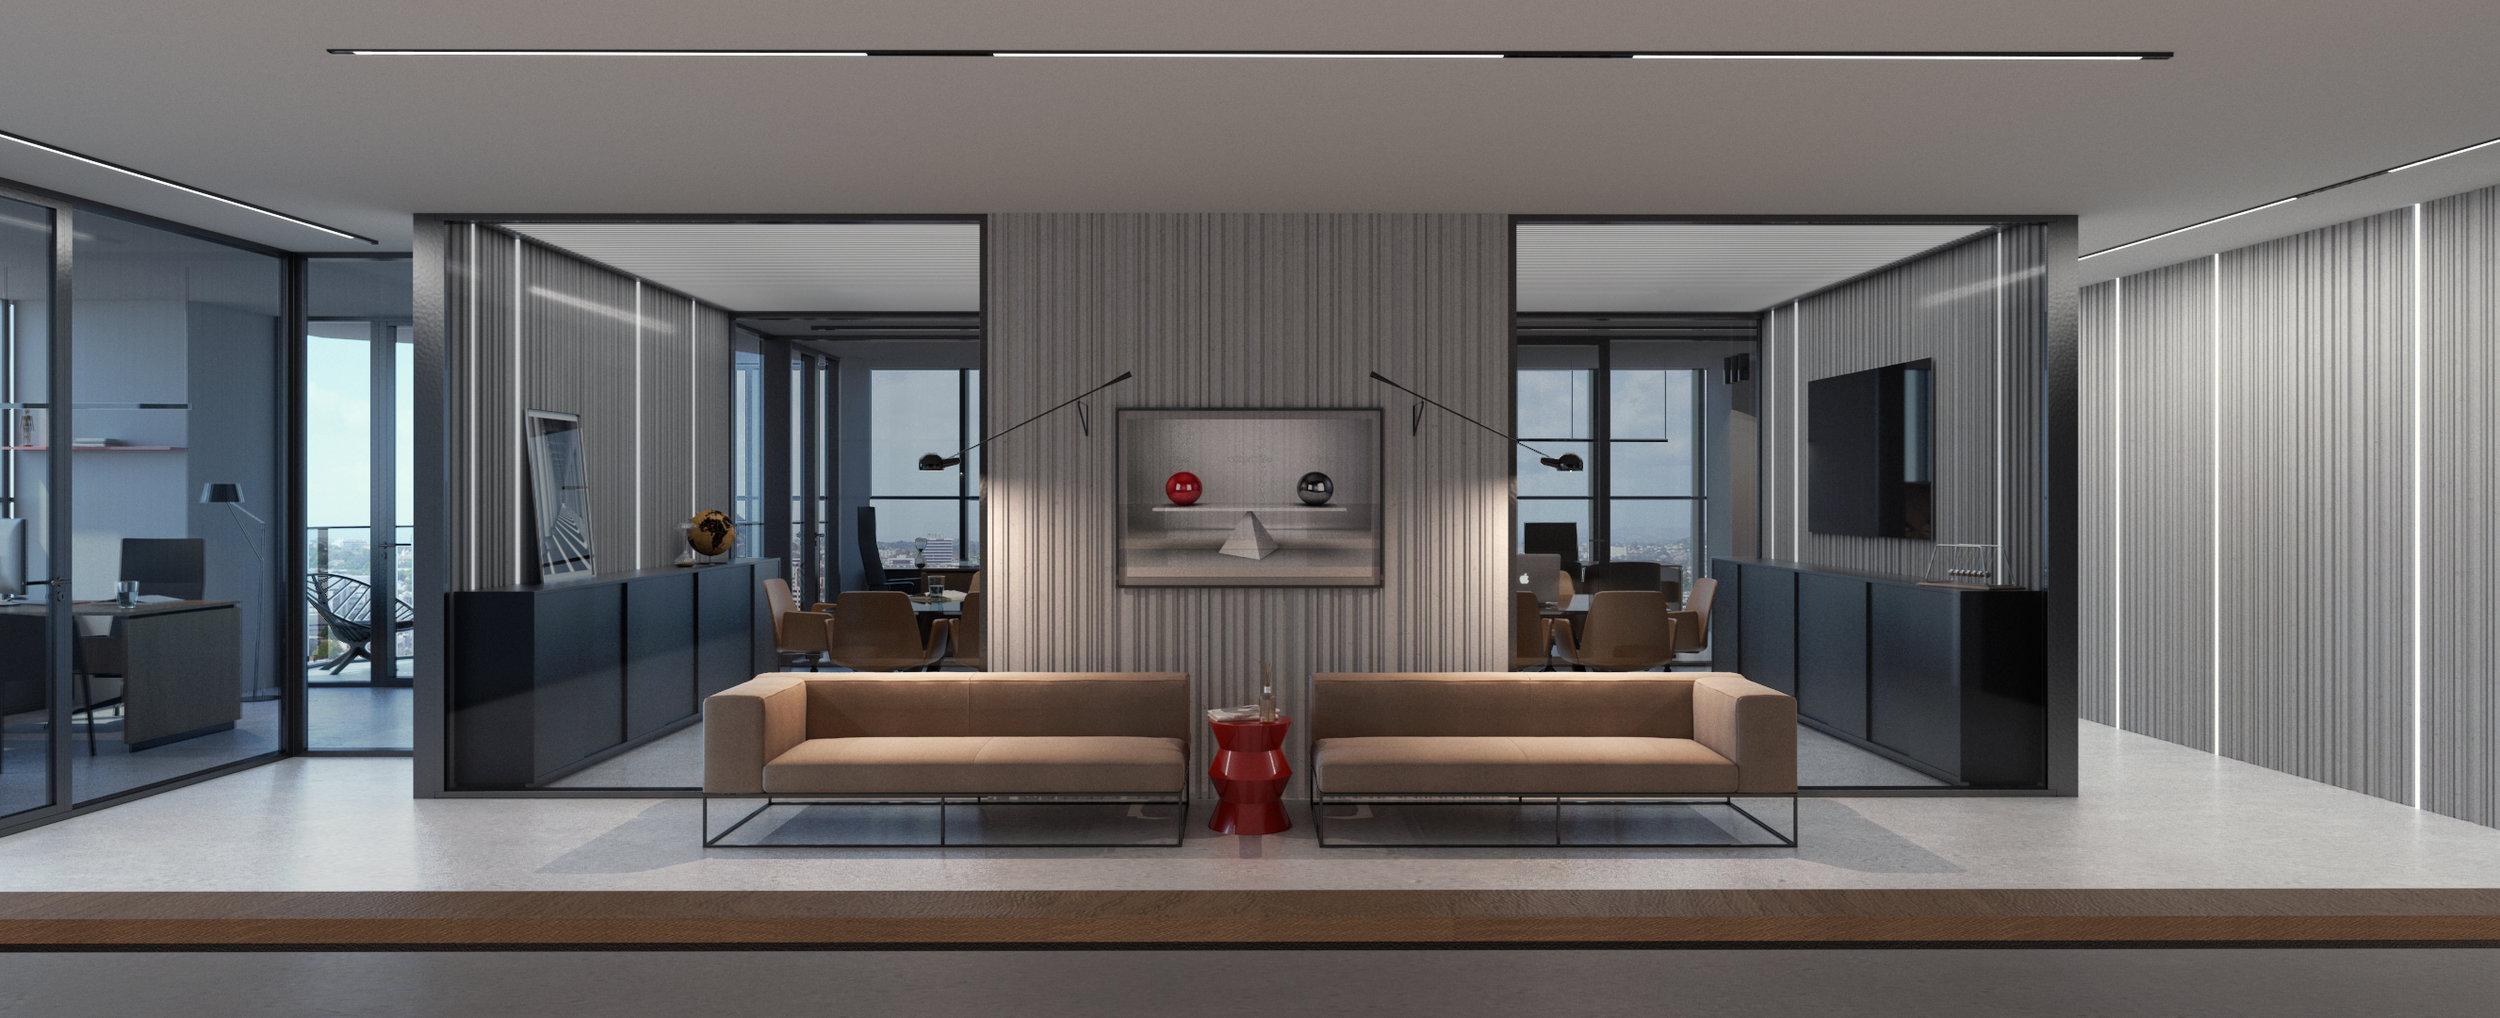 C.A LAW  | Gila Shemie Zakay Interior Design